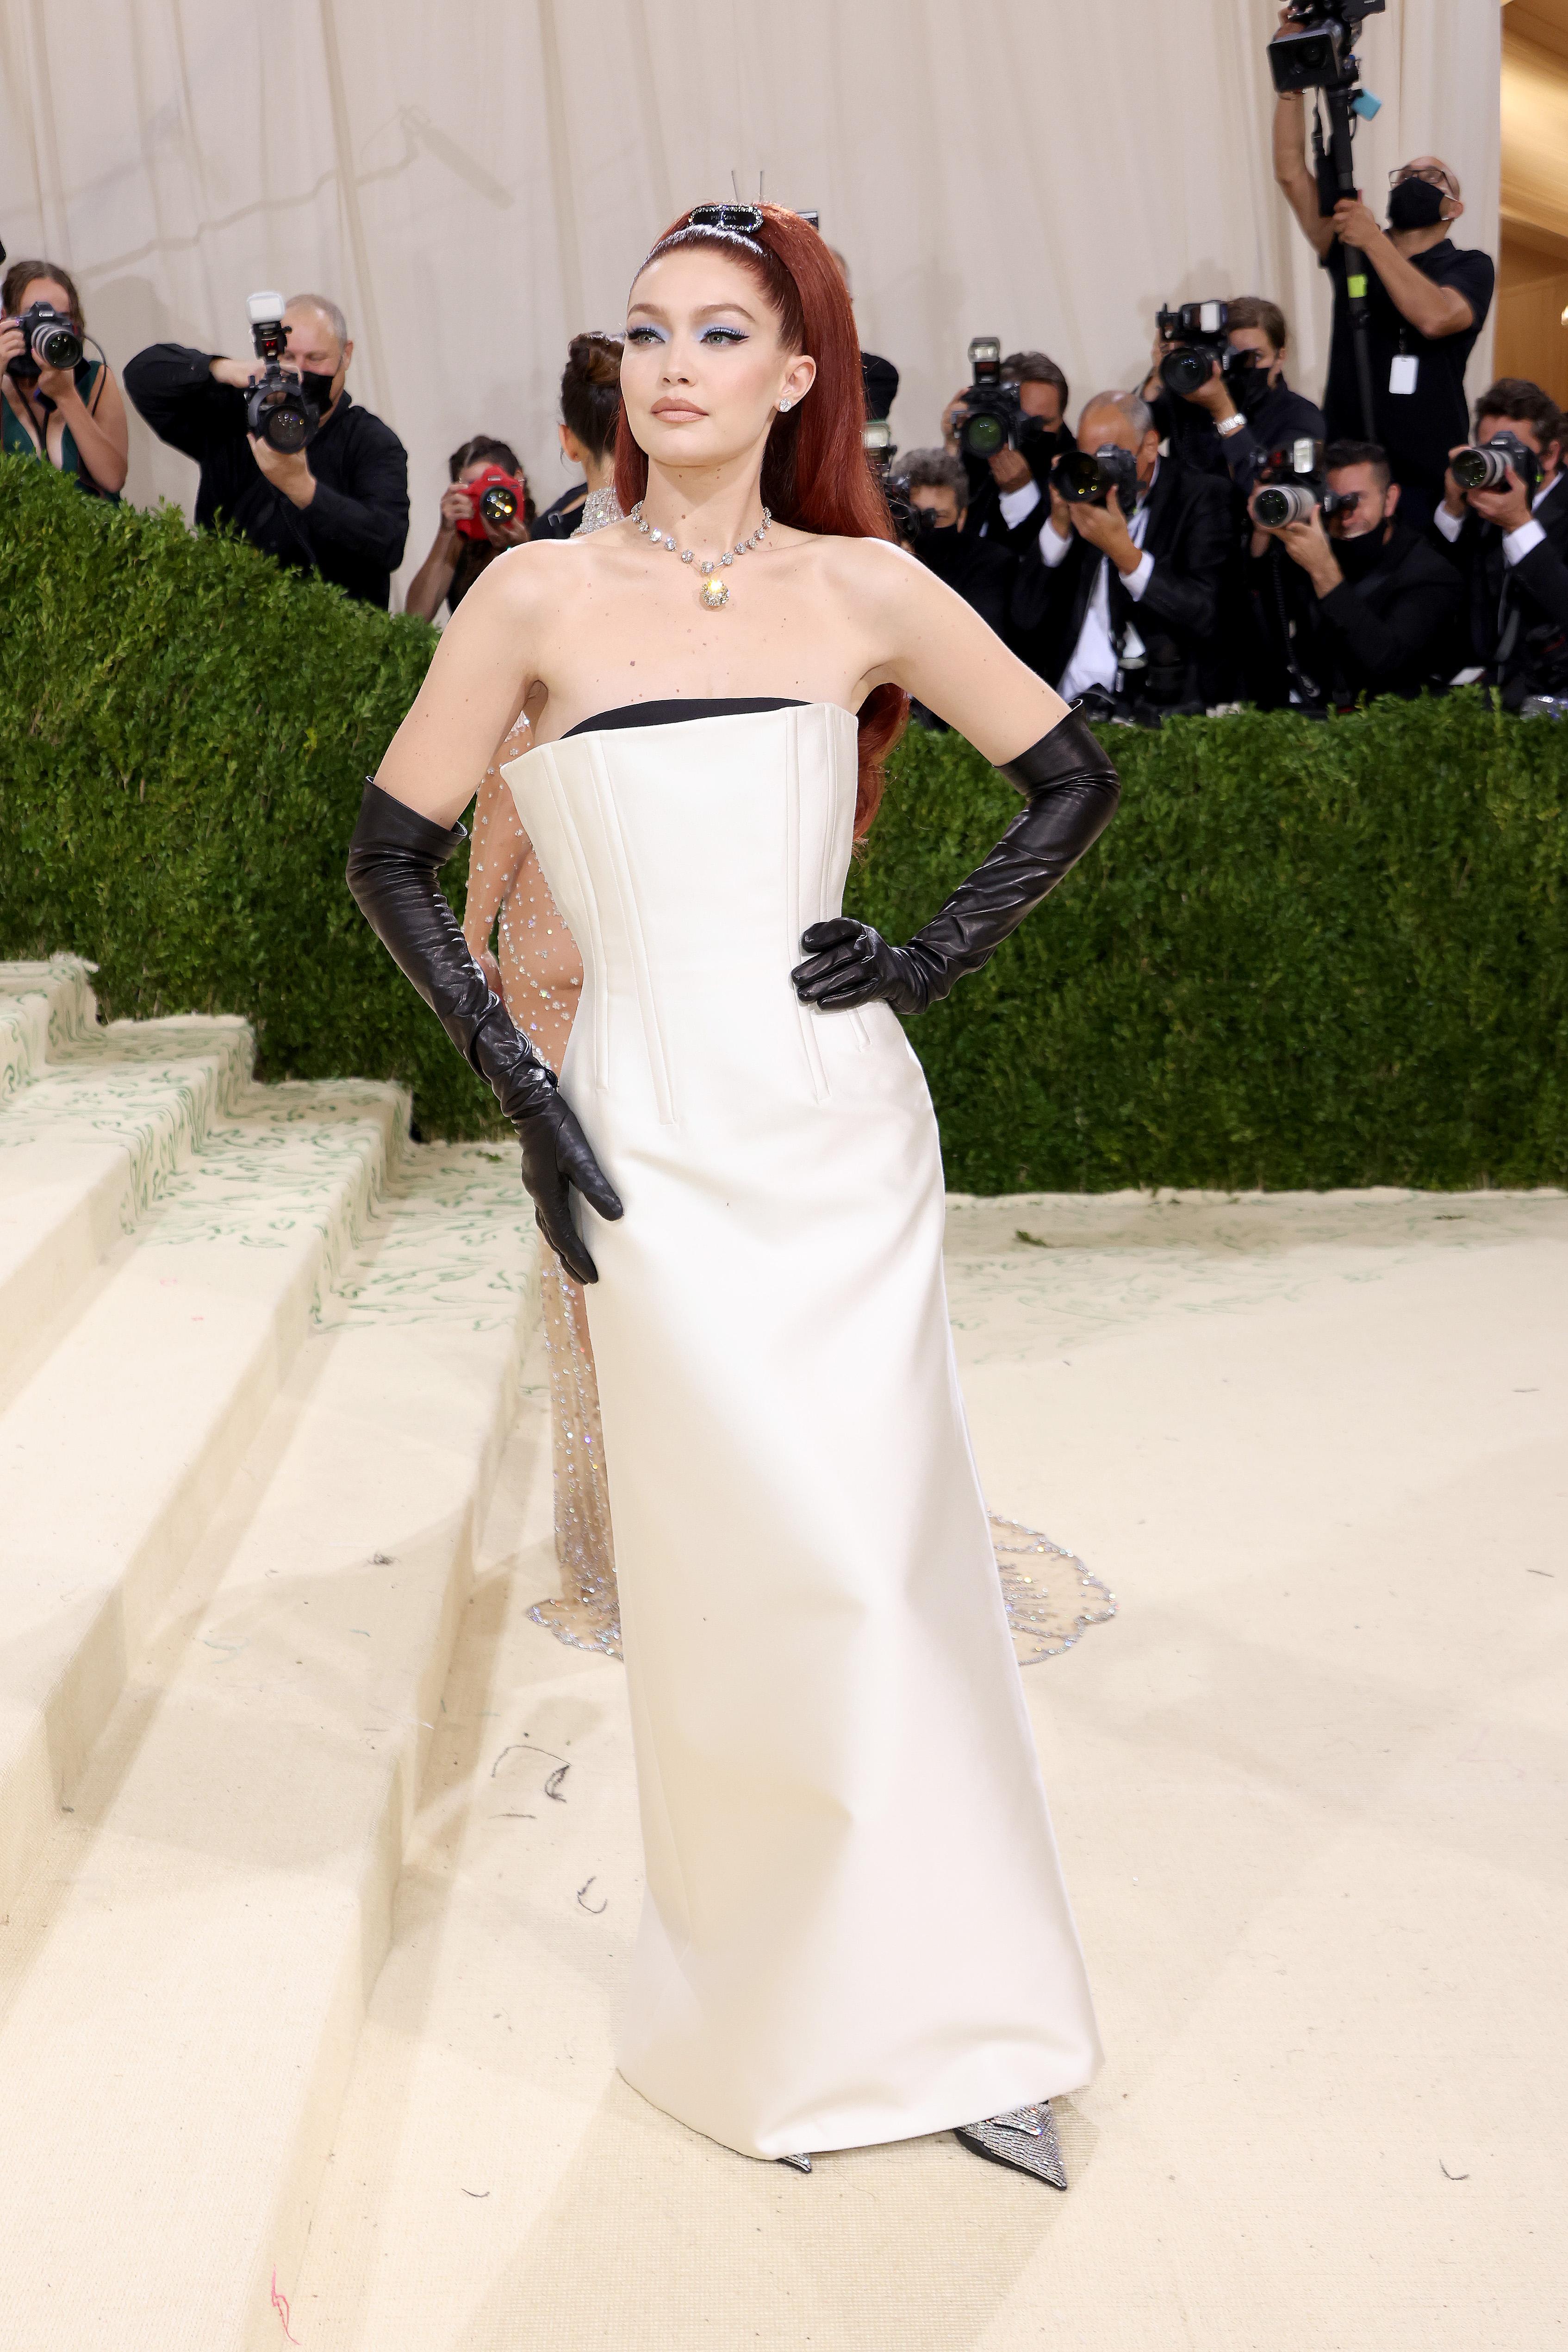 Gigi Hadid at the Met Gala